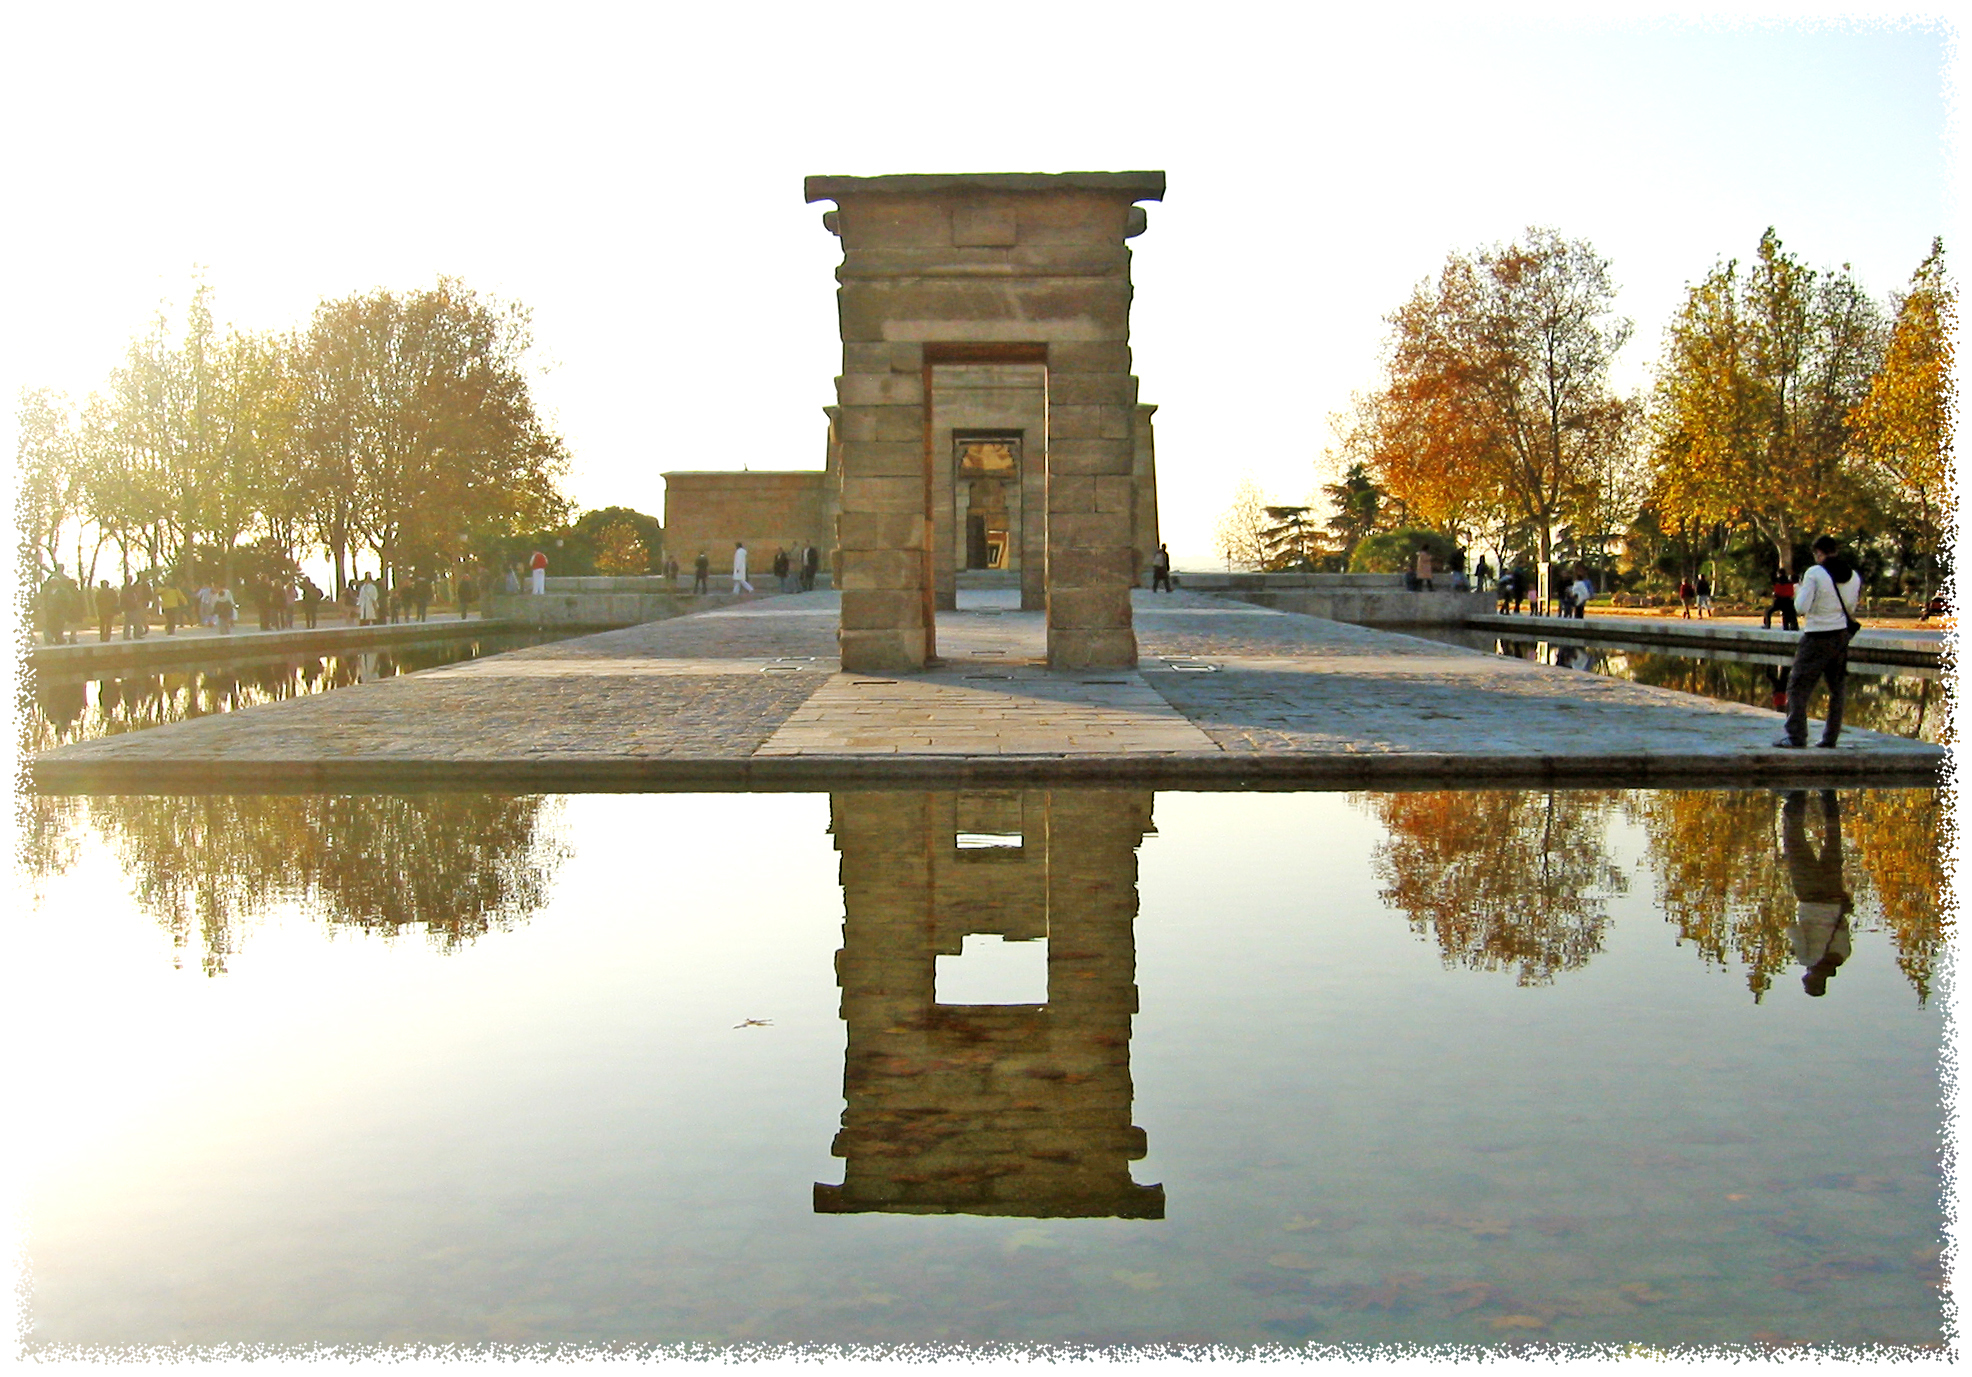 File:Templo de Debod (Madrid) 08.jpg